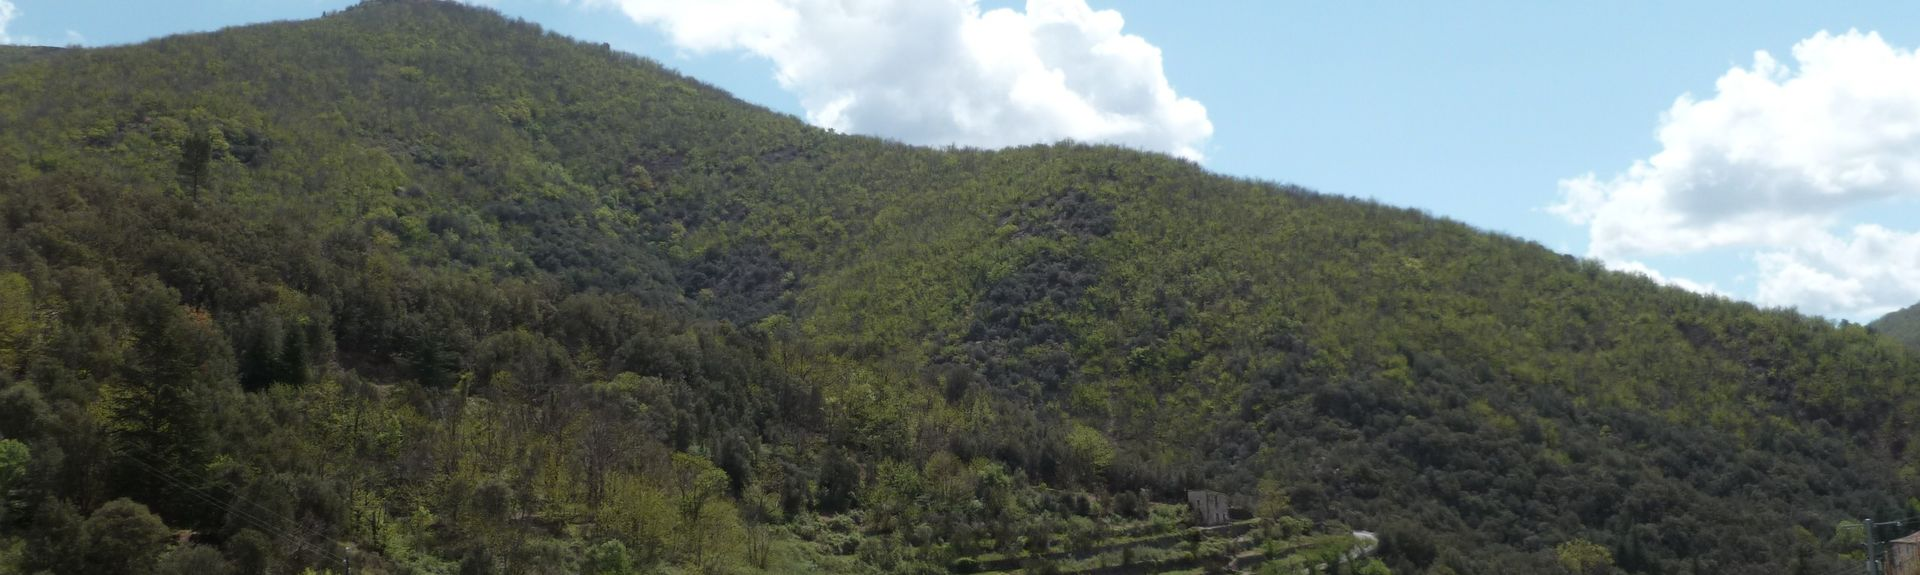 Ardaillès, Valleraugue, France